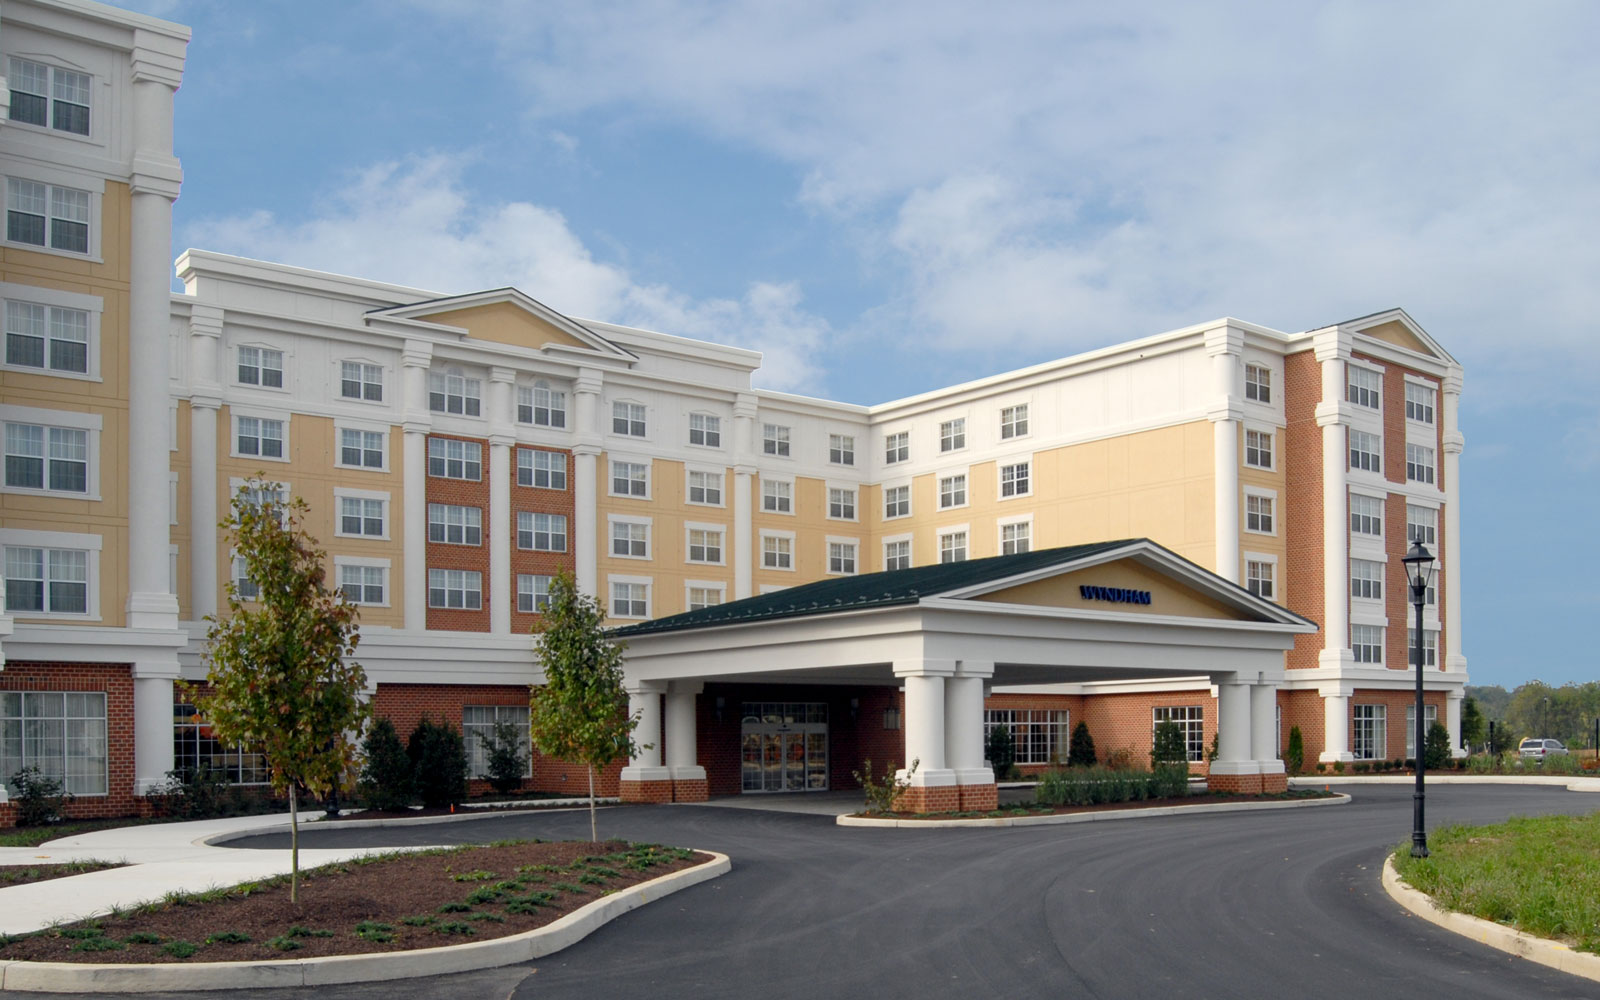 Hotels Near Gettysburg Pa